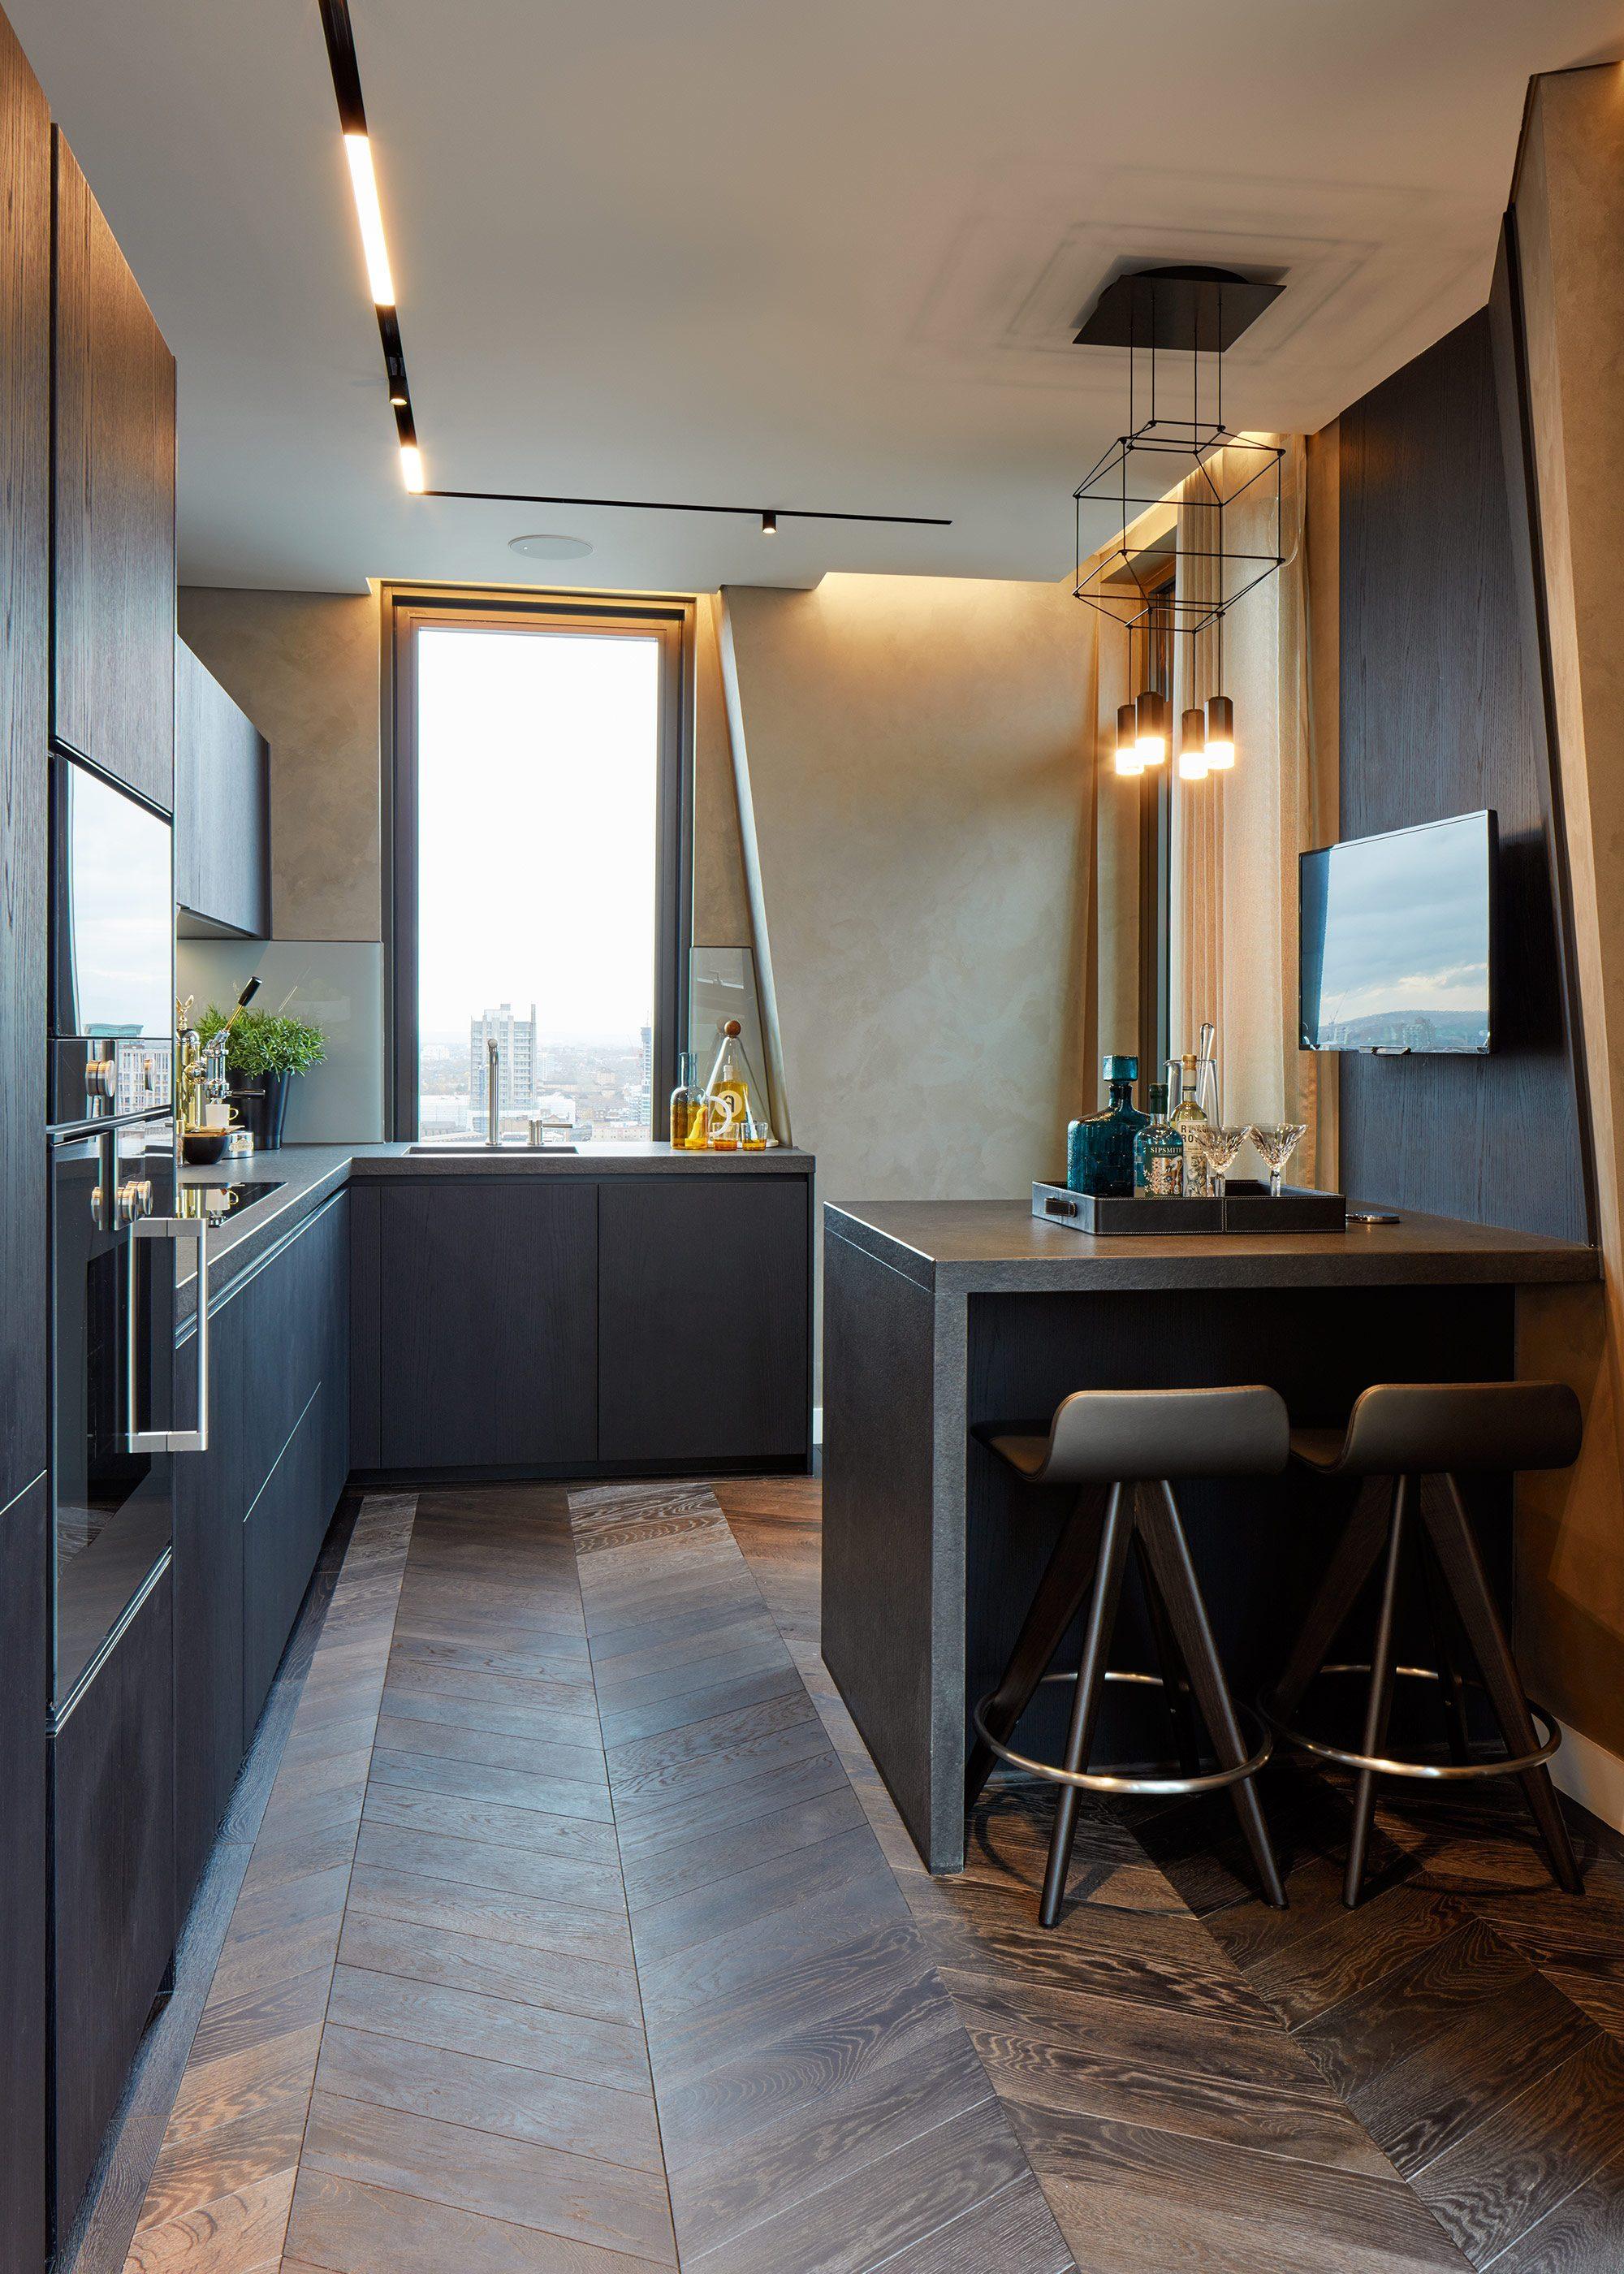 Honky Interior Design Parliament House London Kitchen